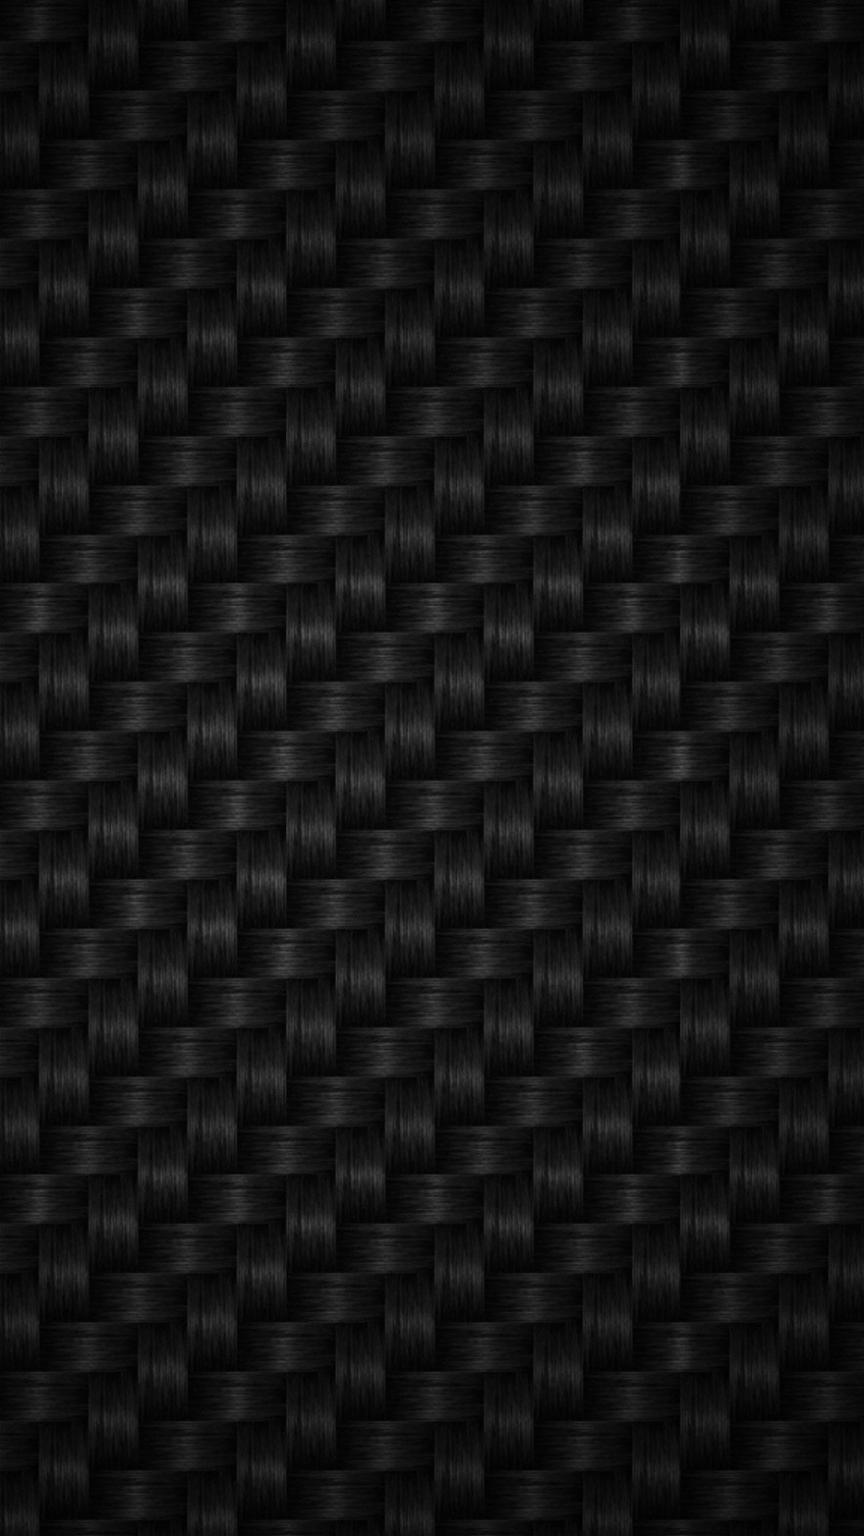 Wallpapers For Samsung Galaxy Tab 101 Samsung Galaxy Tablet 101 864x1536